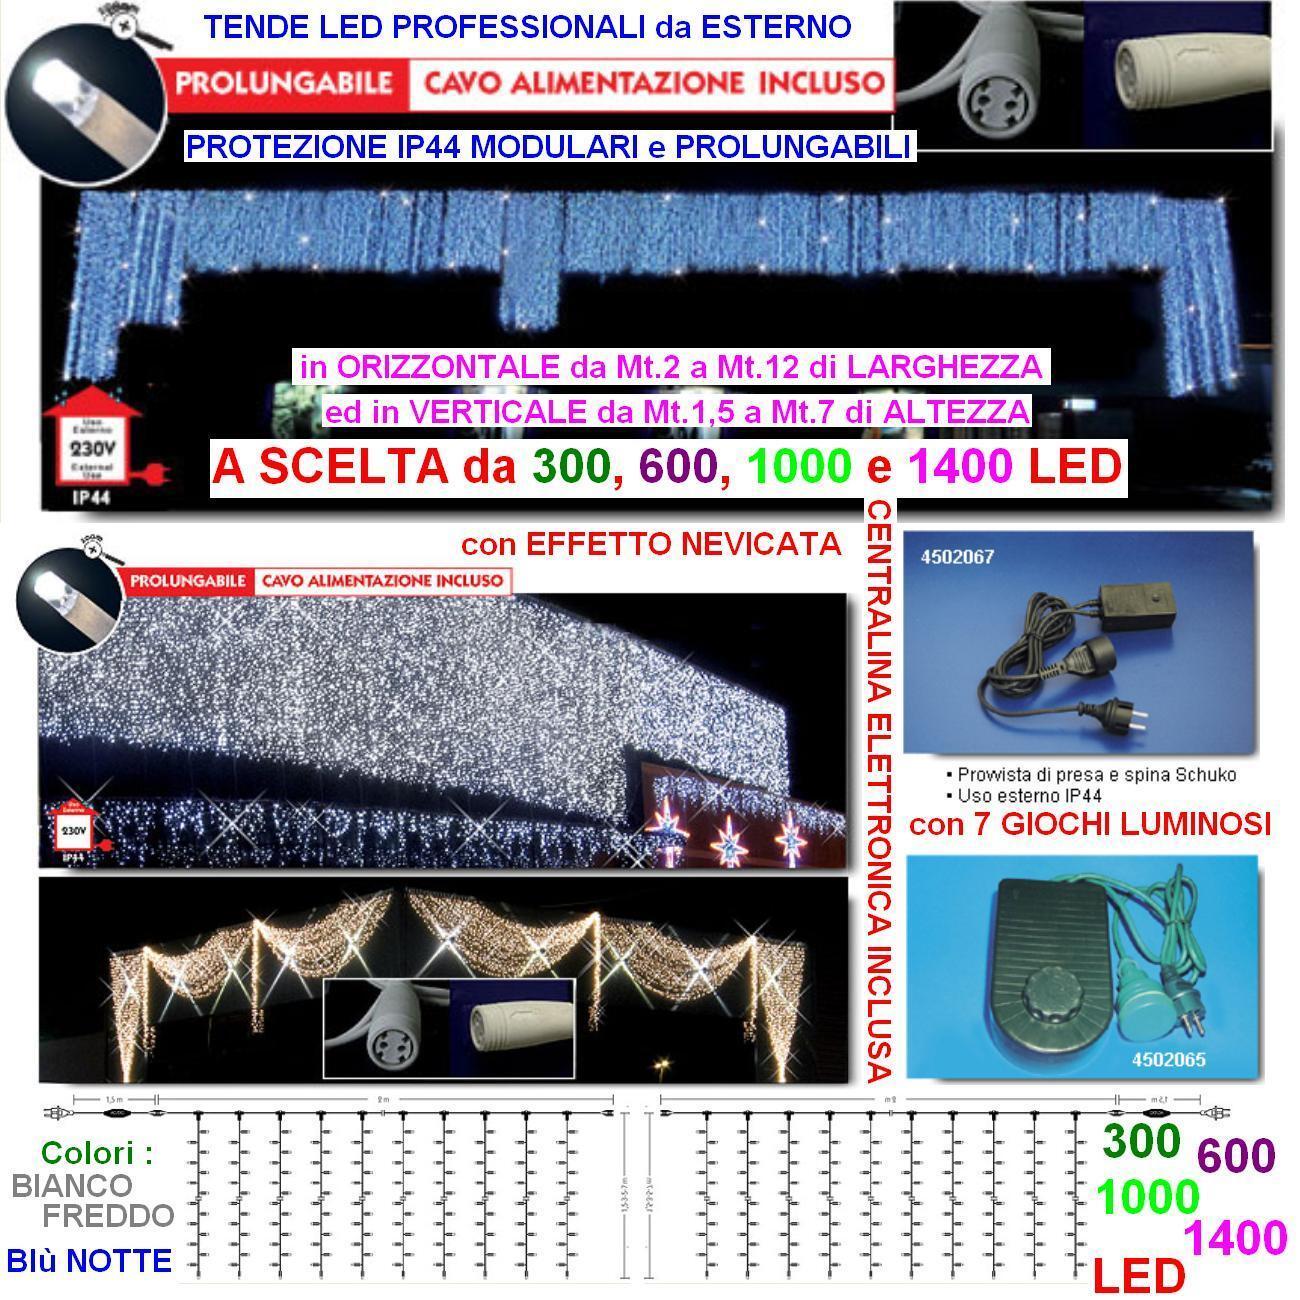 STORE PROFESSIONNEL 1000 LED BLEU Cm.200 L x 500 EXTENSION H IP44 220V